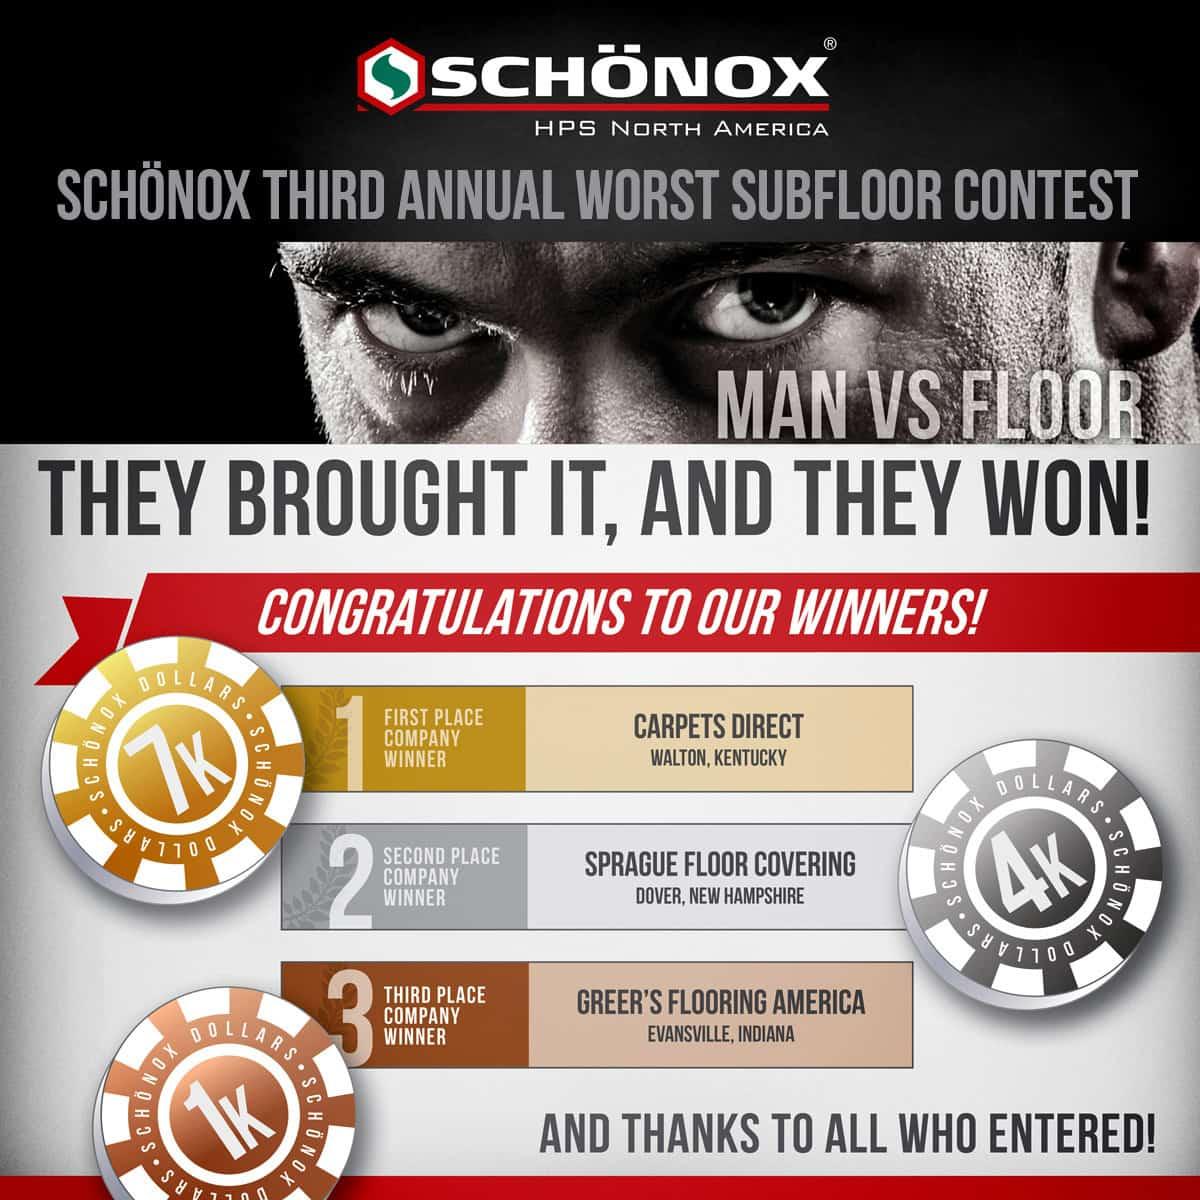 2016 Worst Subfloor Contest Winners